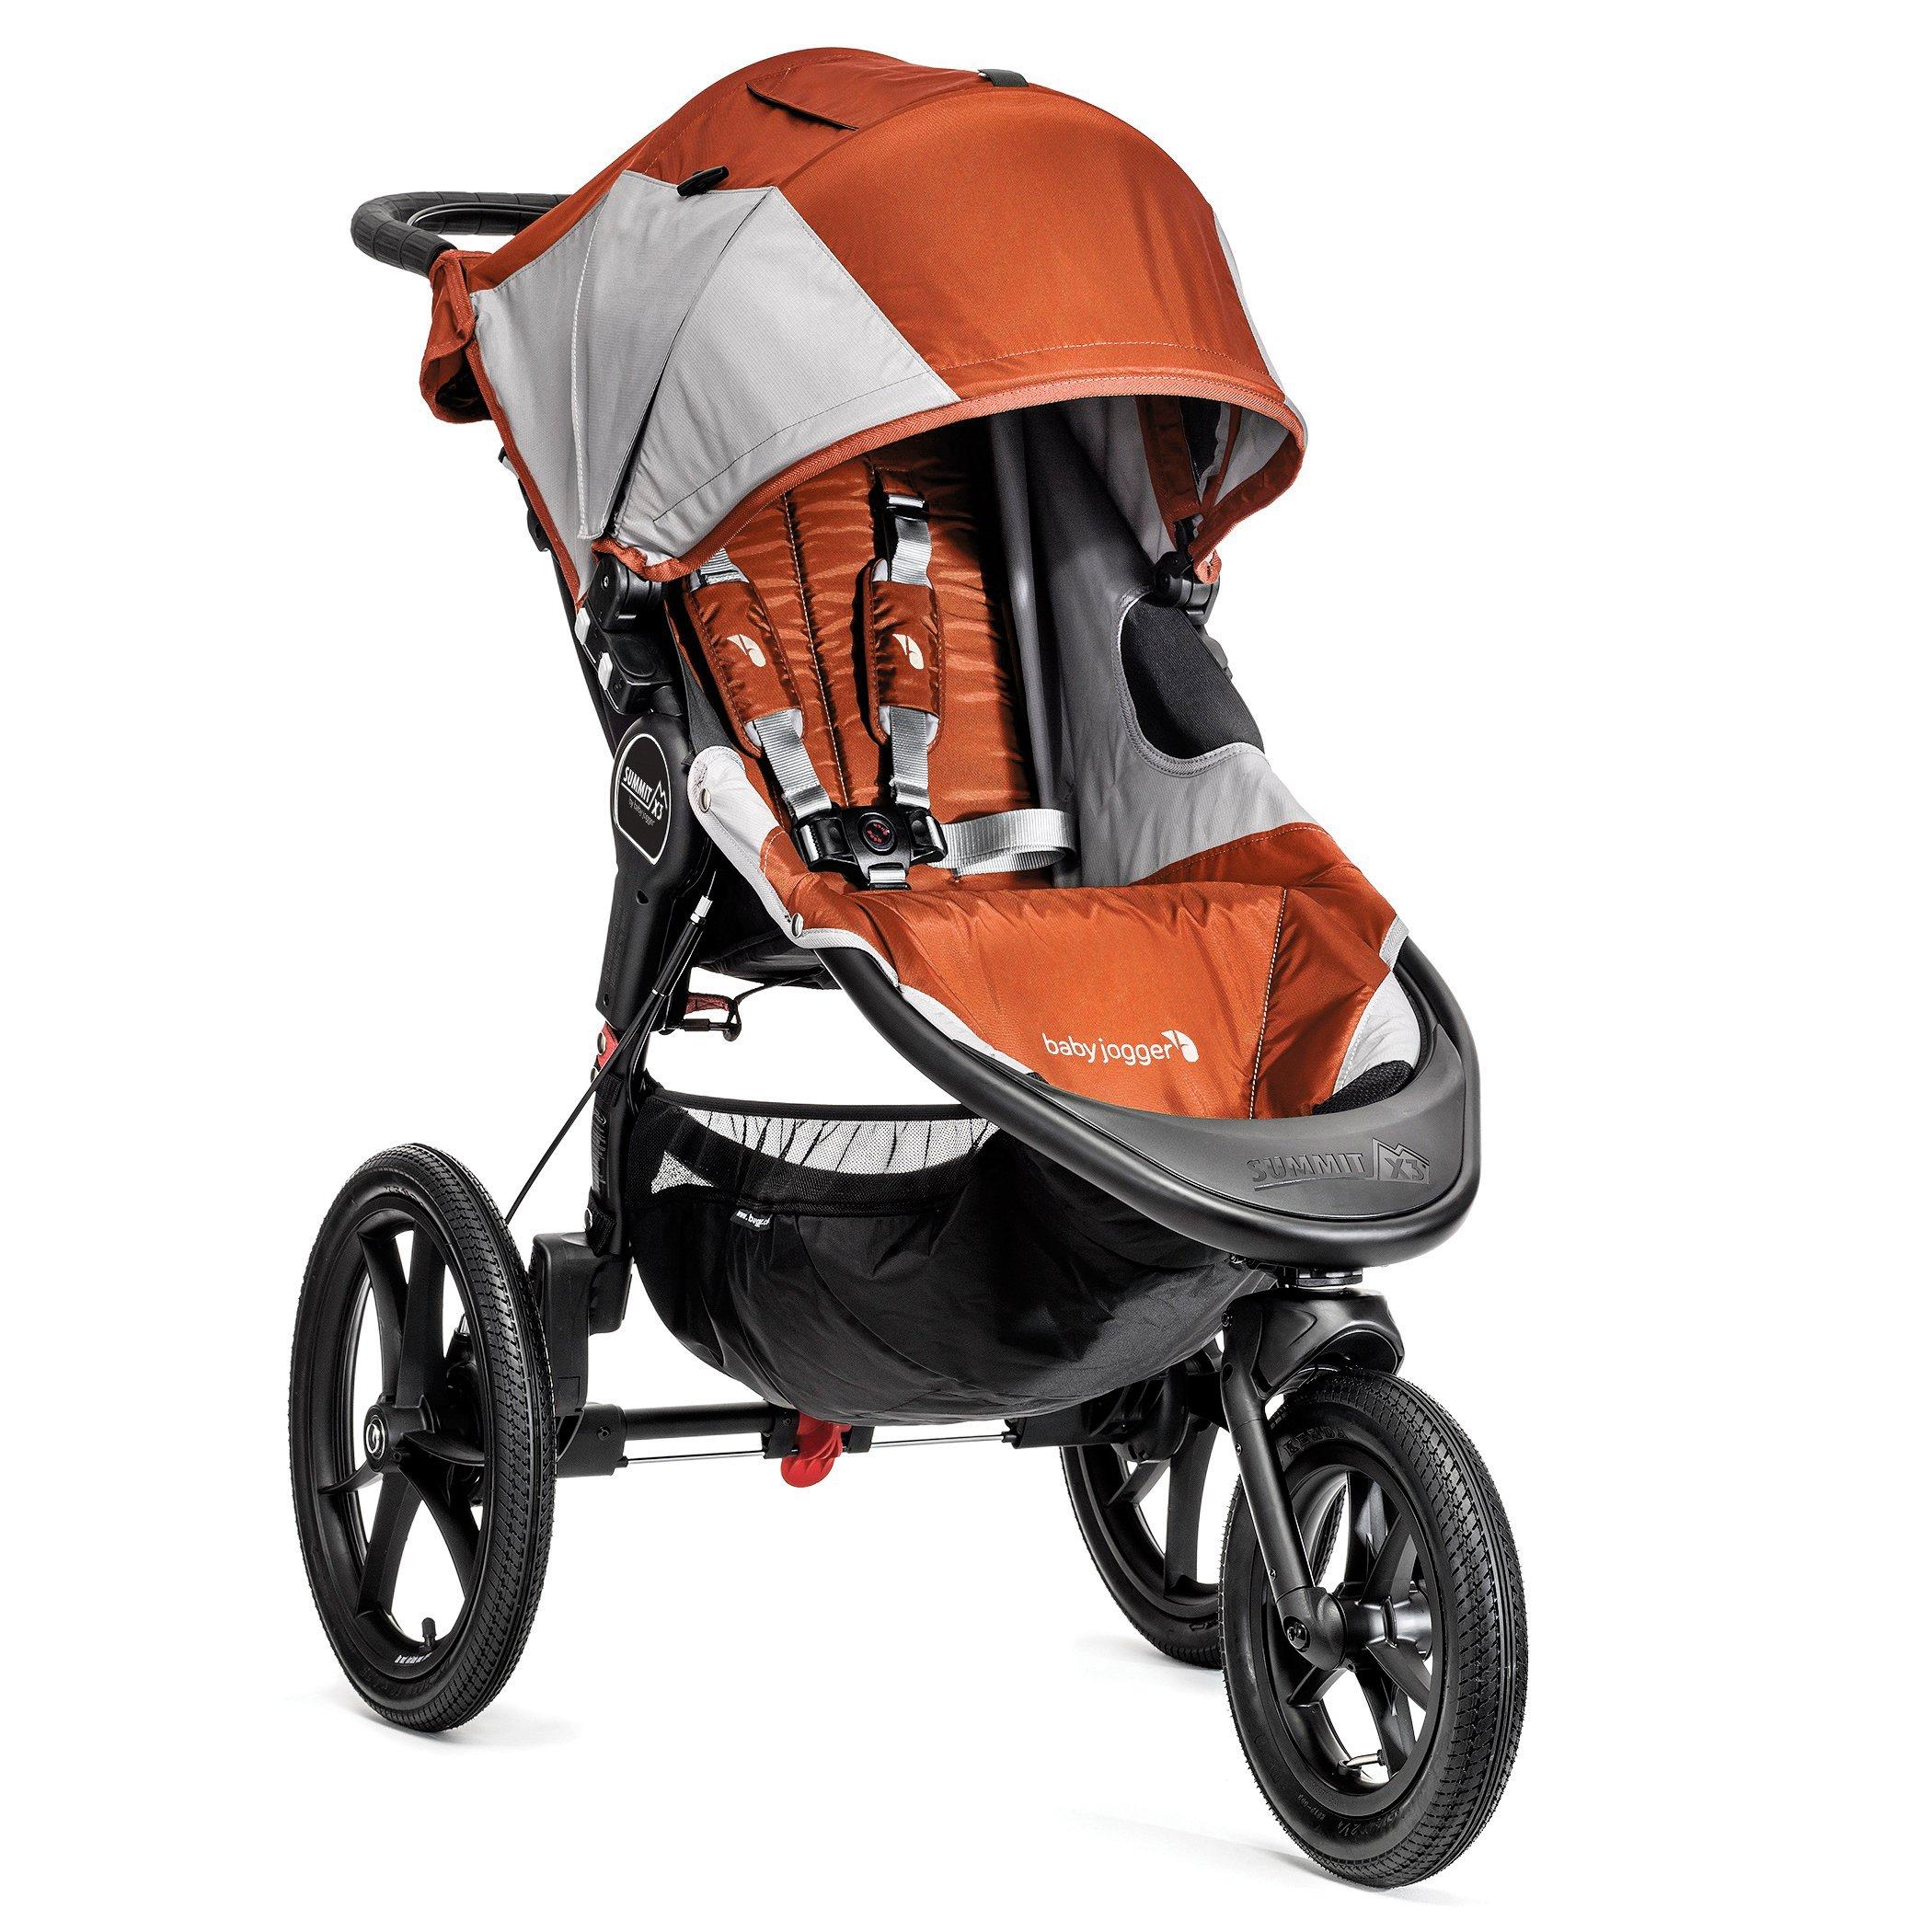 Baby Jogger Summit X3 Single Stroller, Orange/Gray